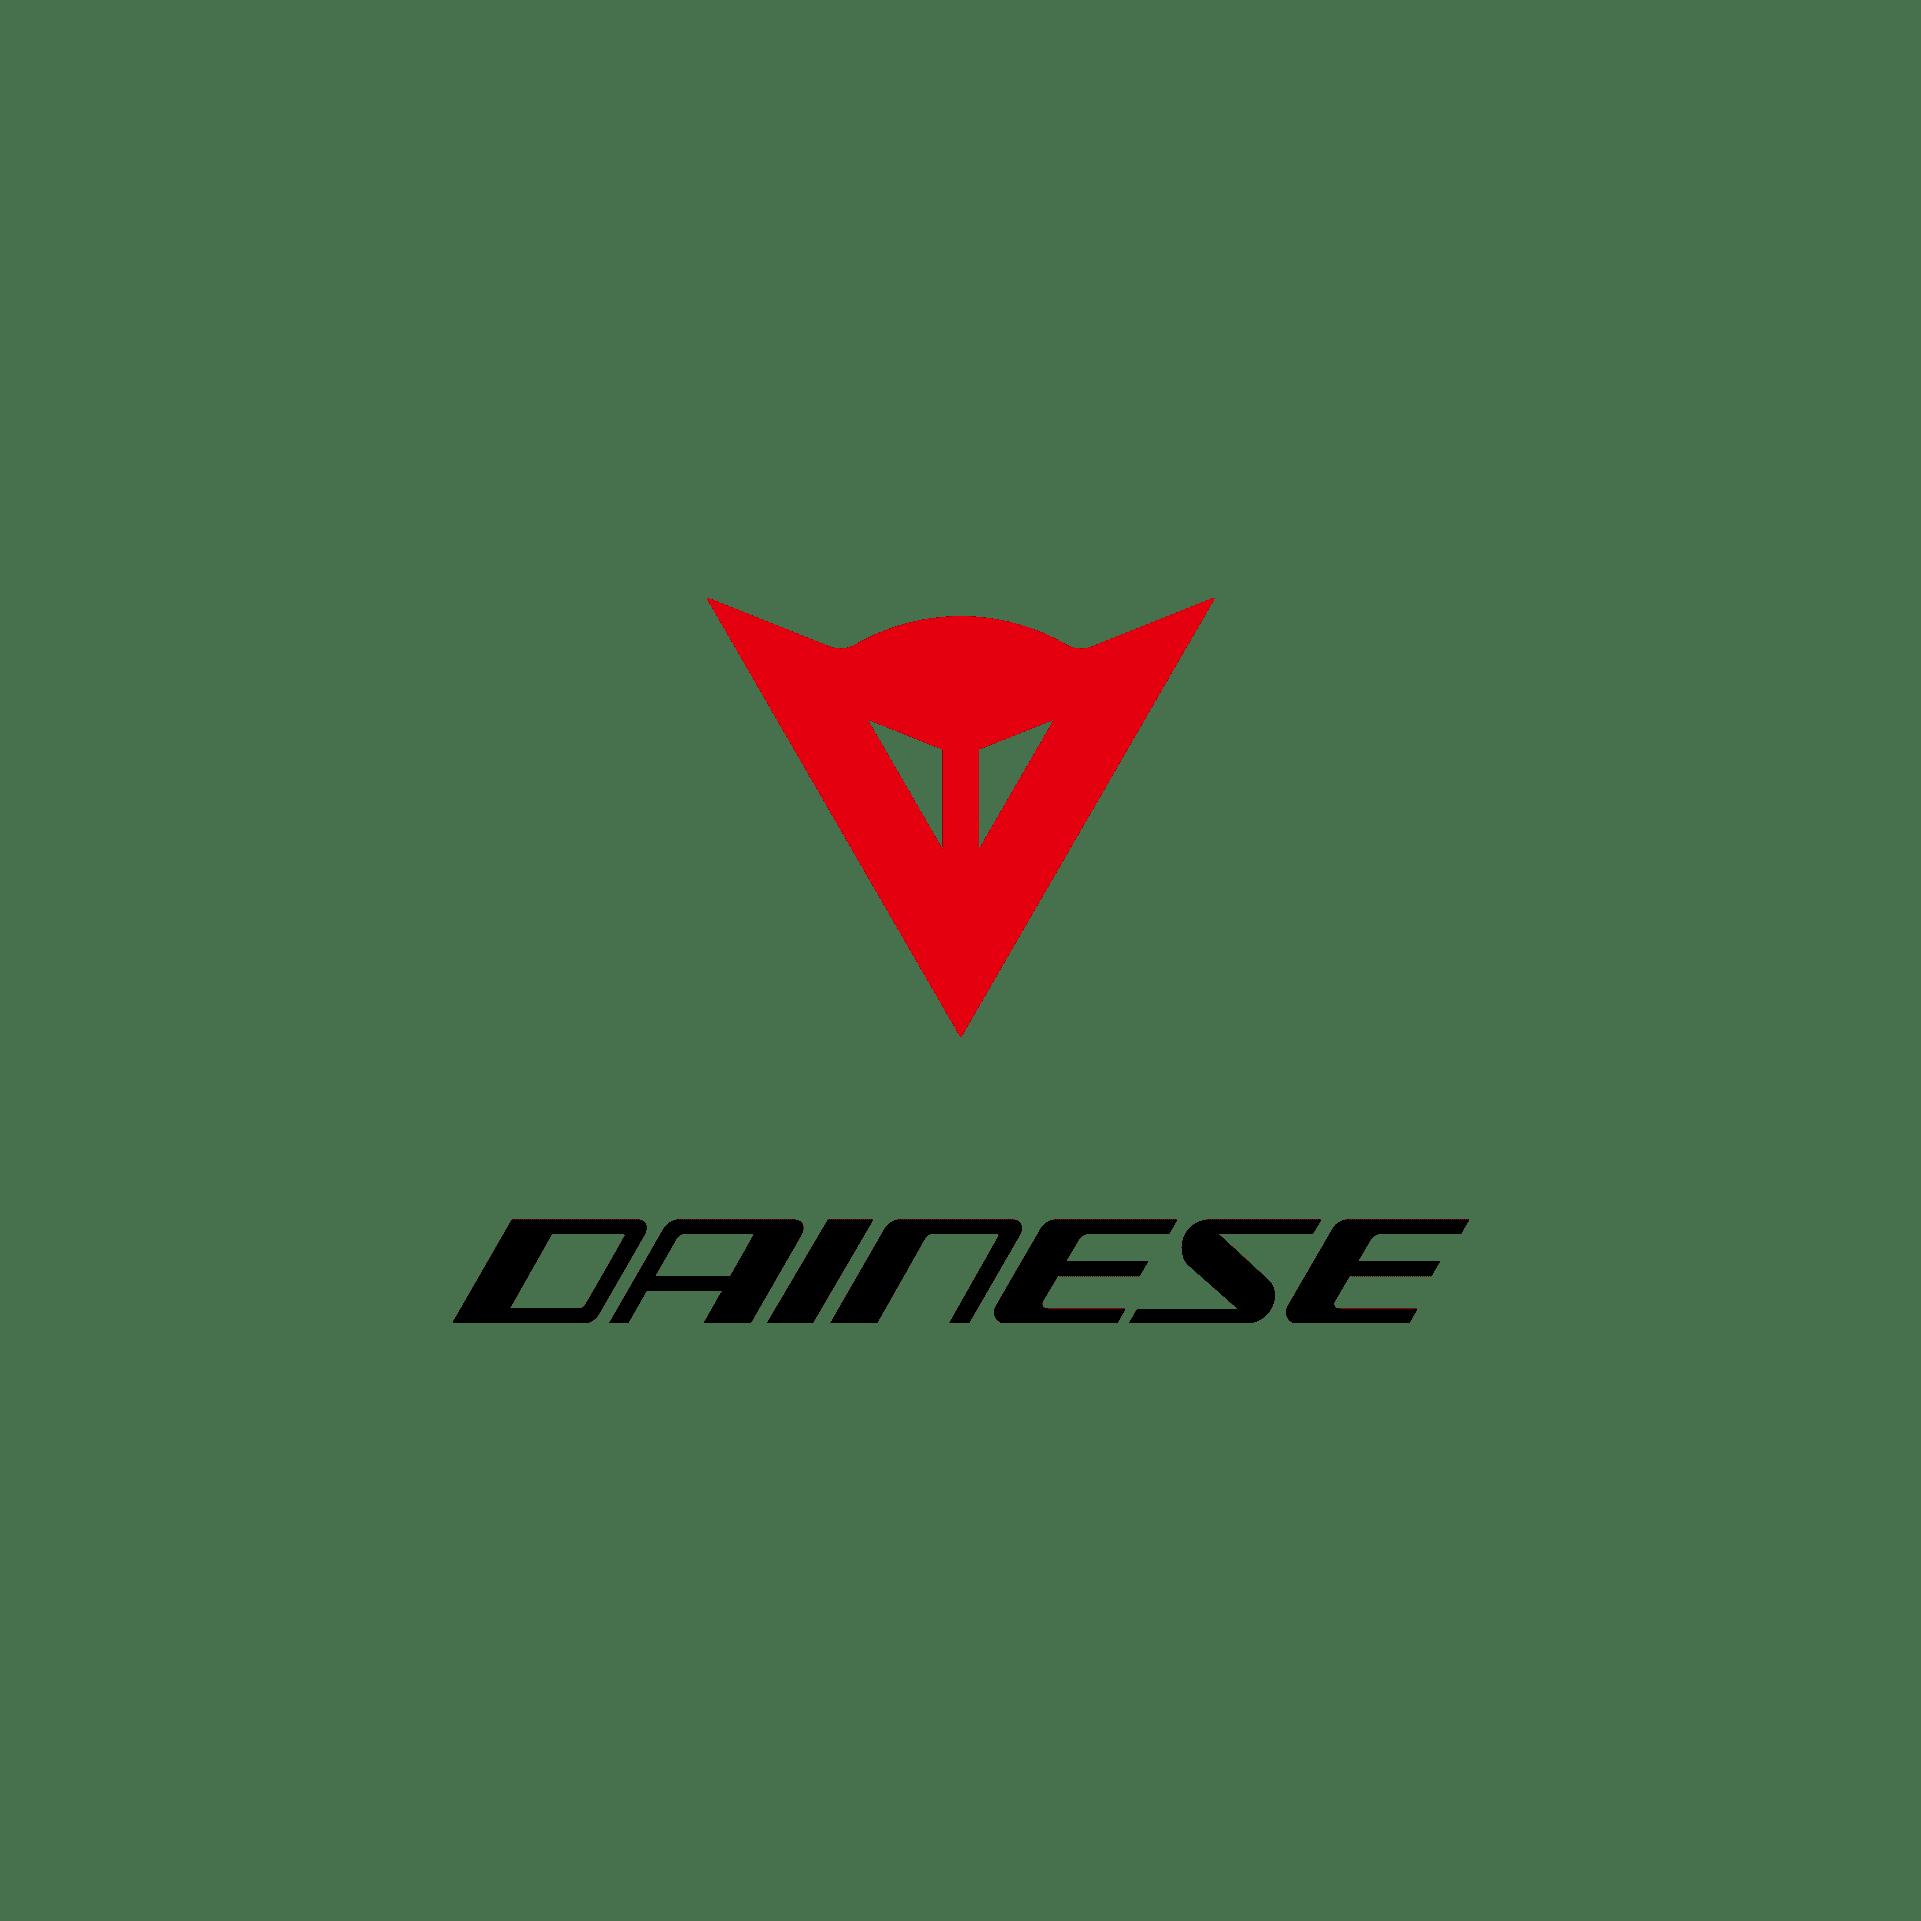 Sponsor tony arbolino, Dainese